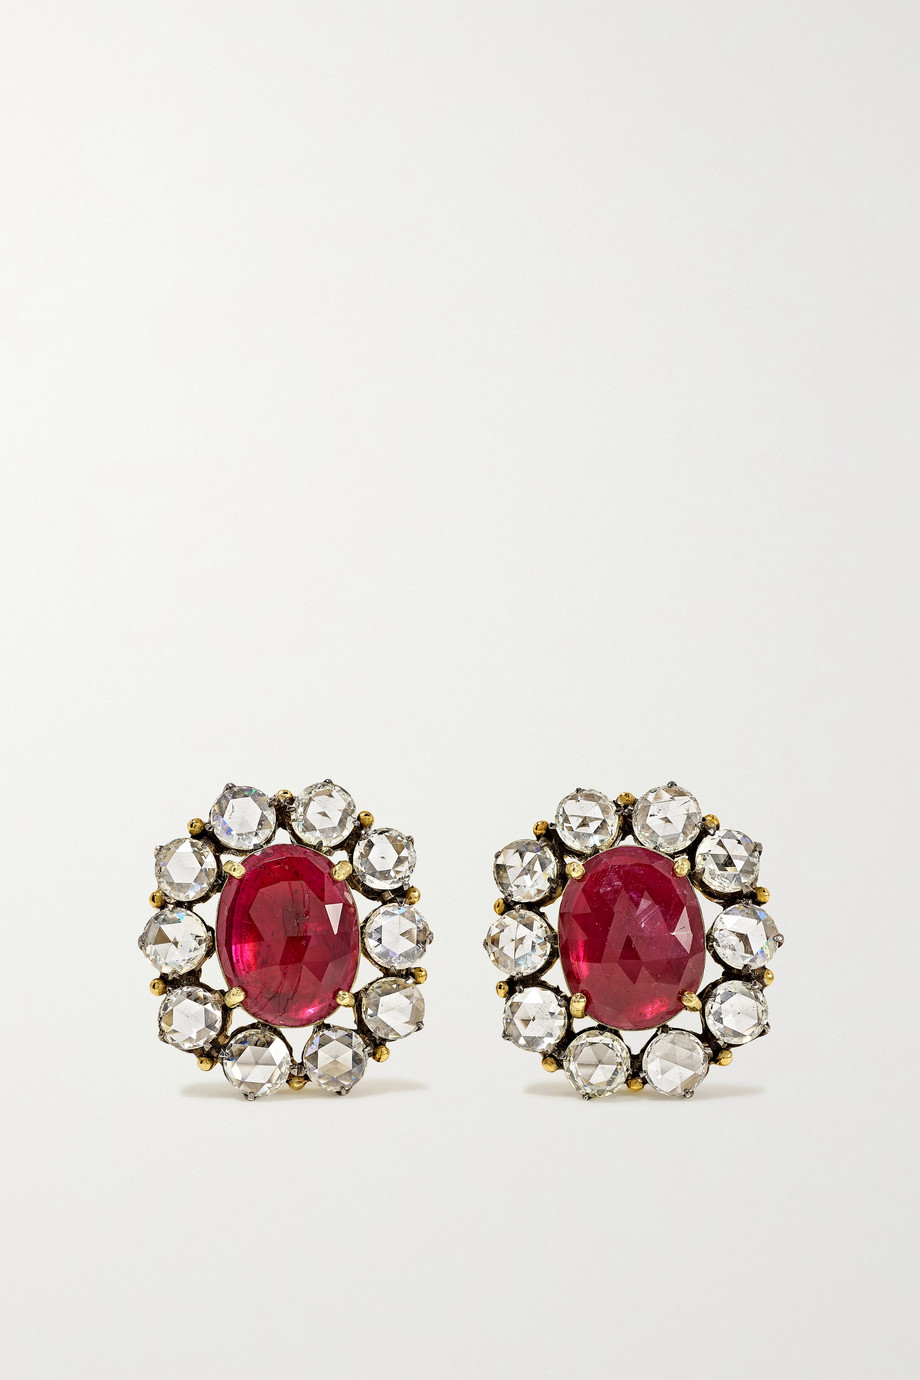 Amrapali 18-karat gold, sterling silver, ruby and diamond earrings